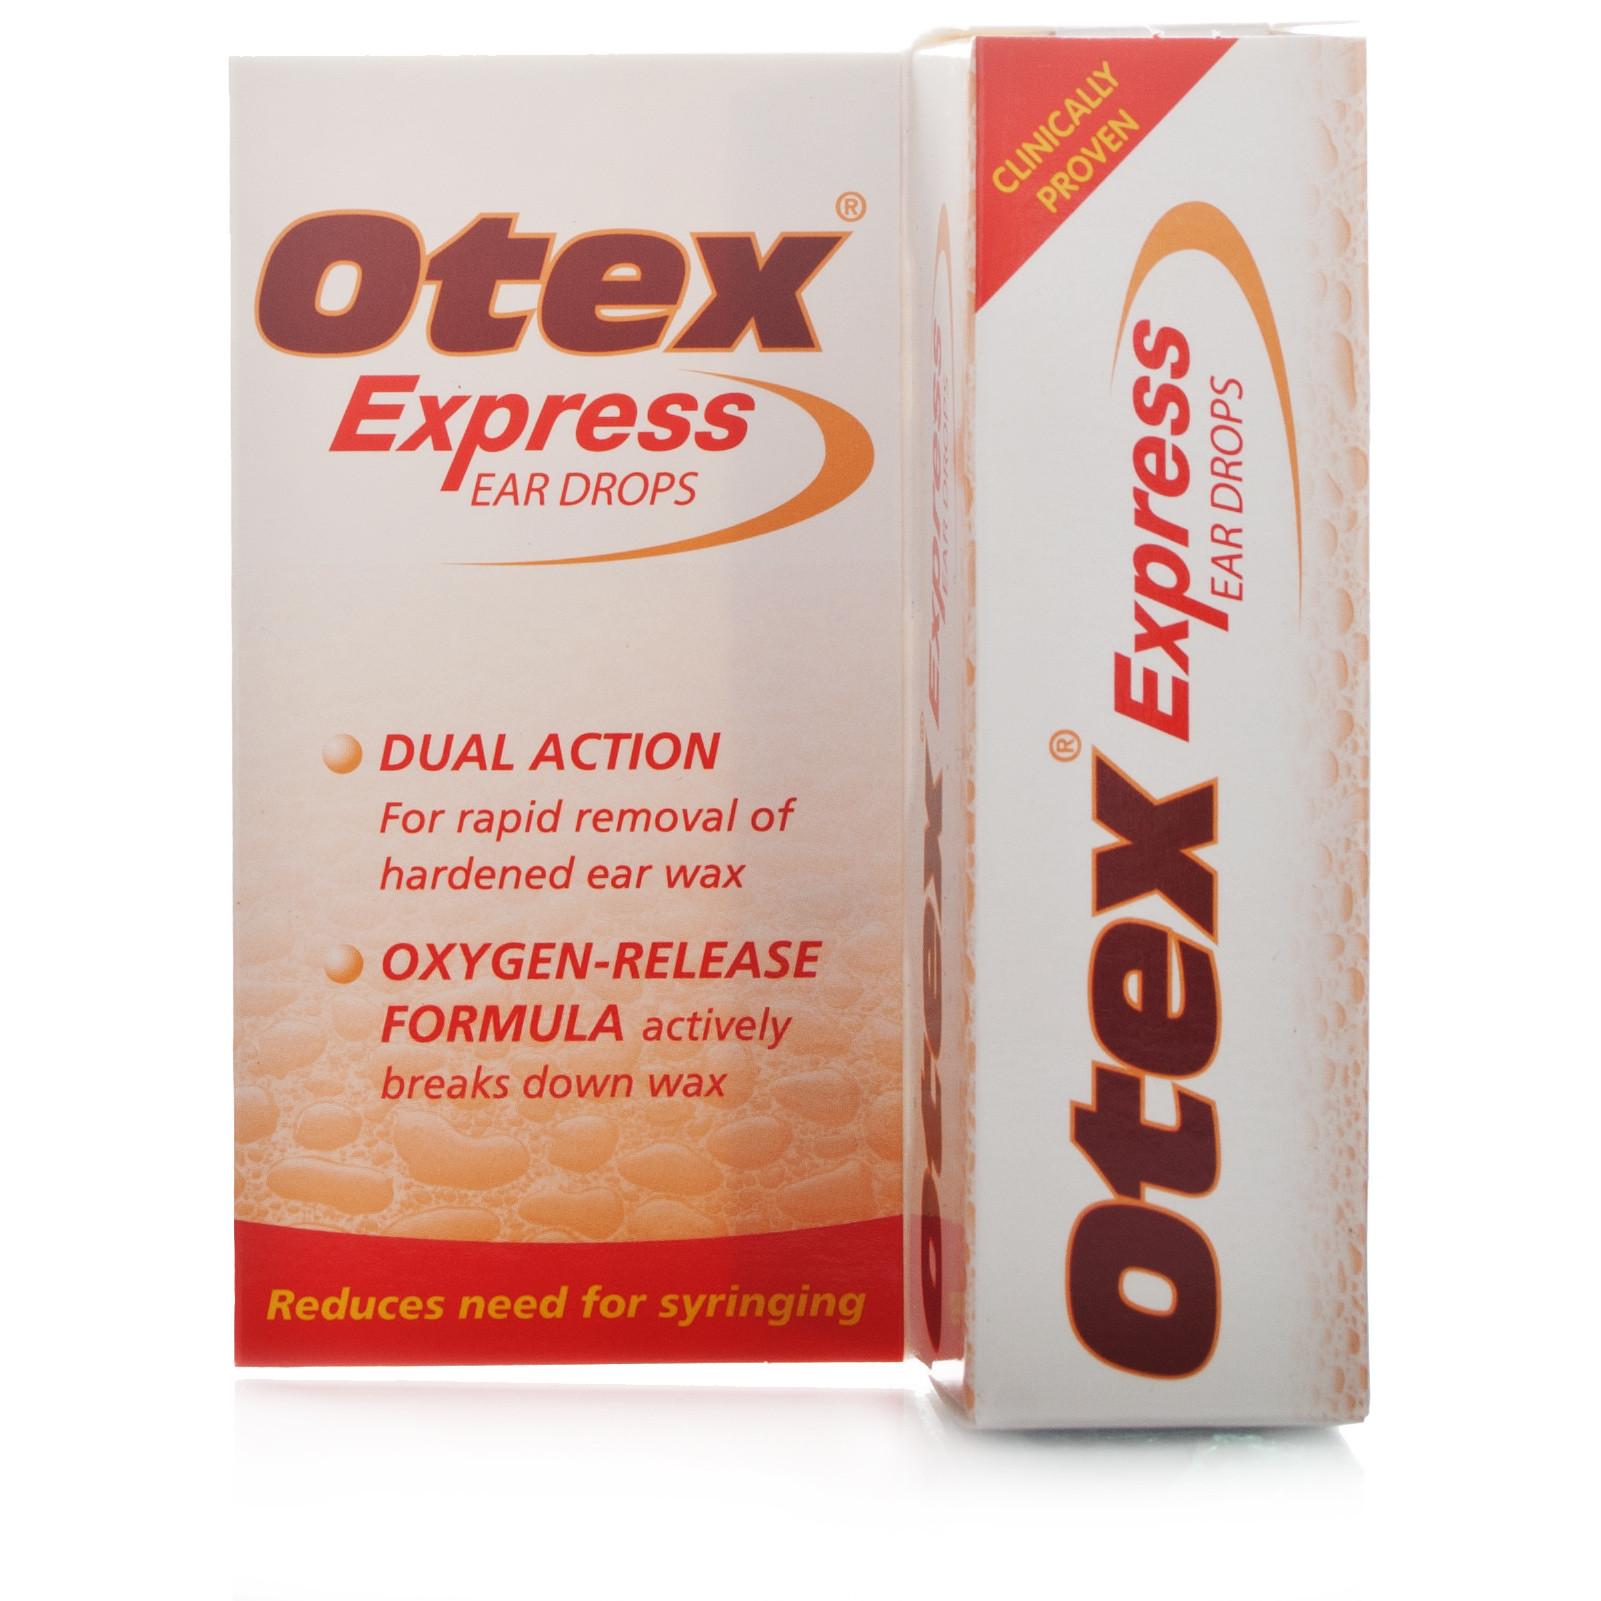 Otex Express Ear Drops